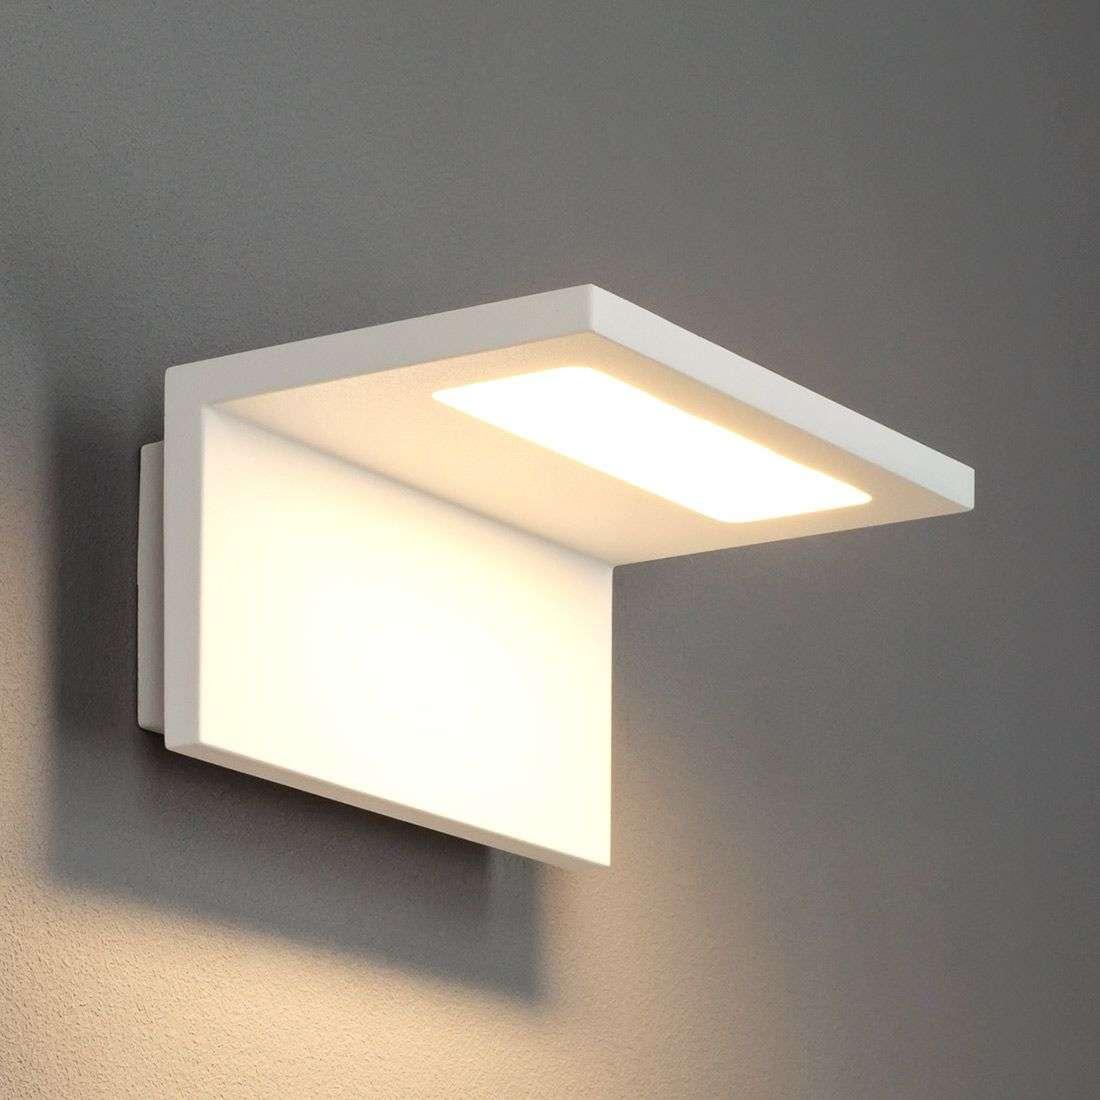 Caner white led exterior wall lamp lights caner white led exterior wall lamp 9619022 31 aloadofball Image collections